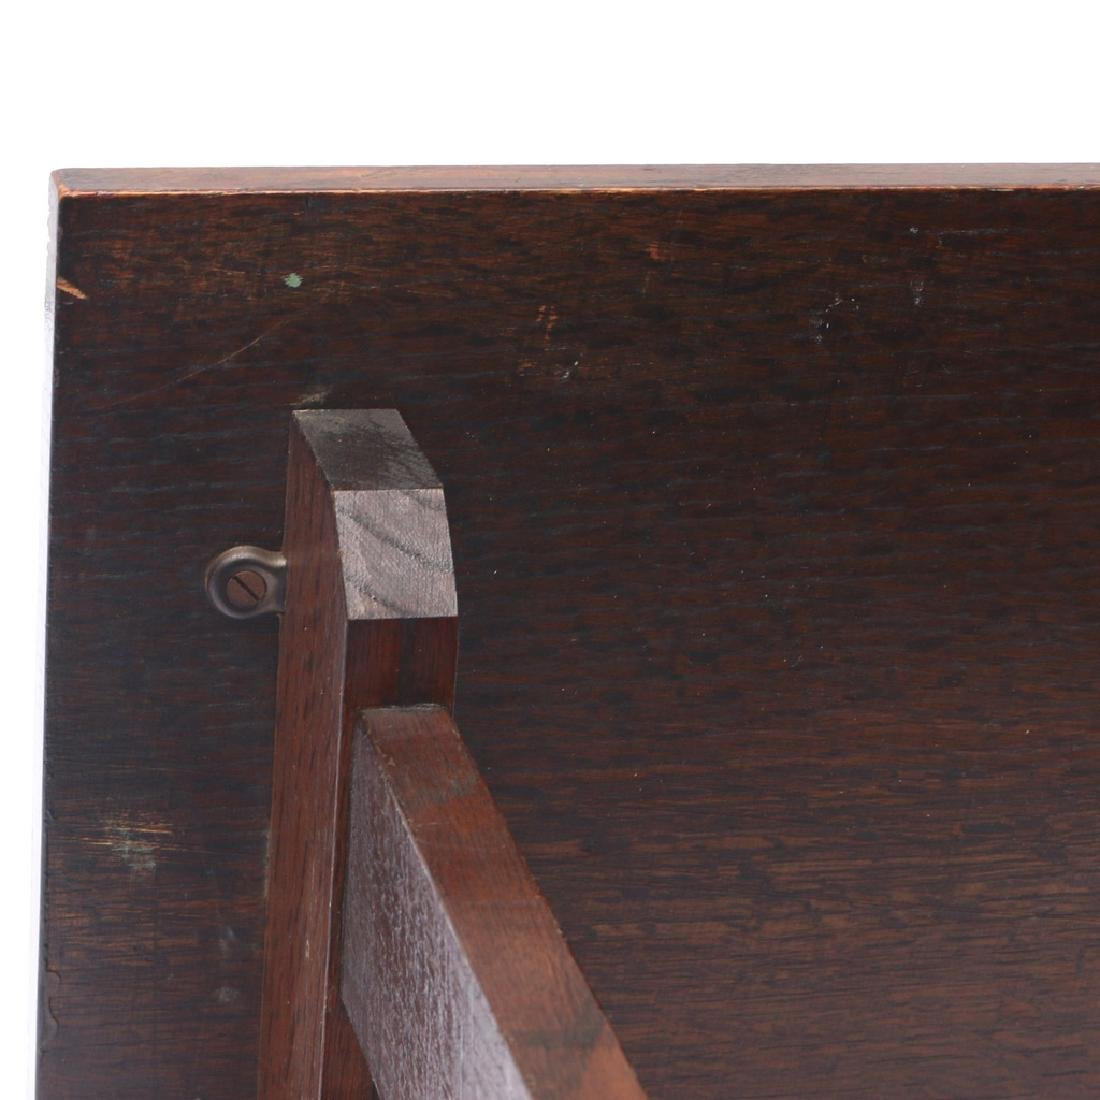 ROYCROFT SIDE TABLE - 7